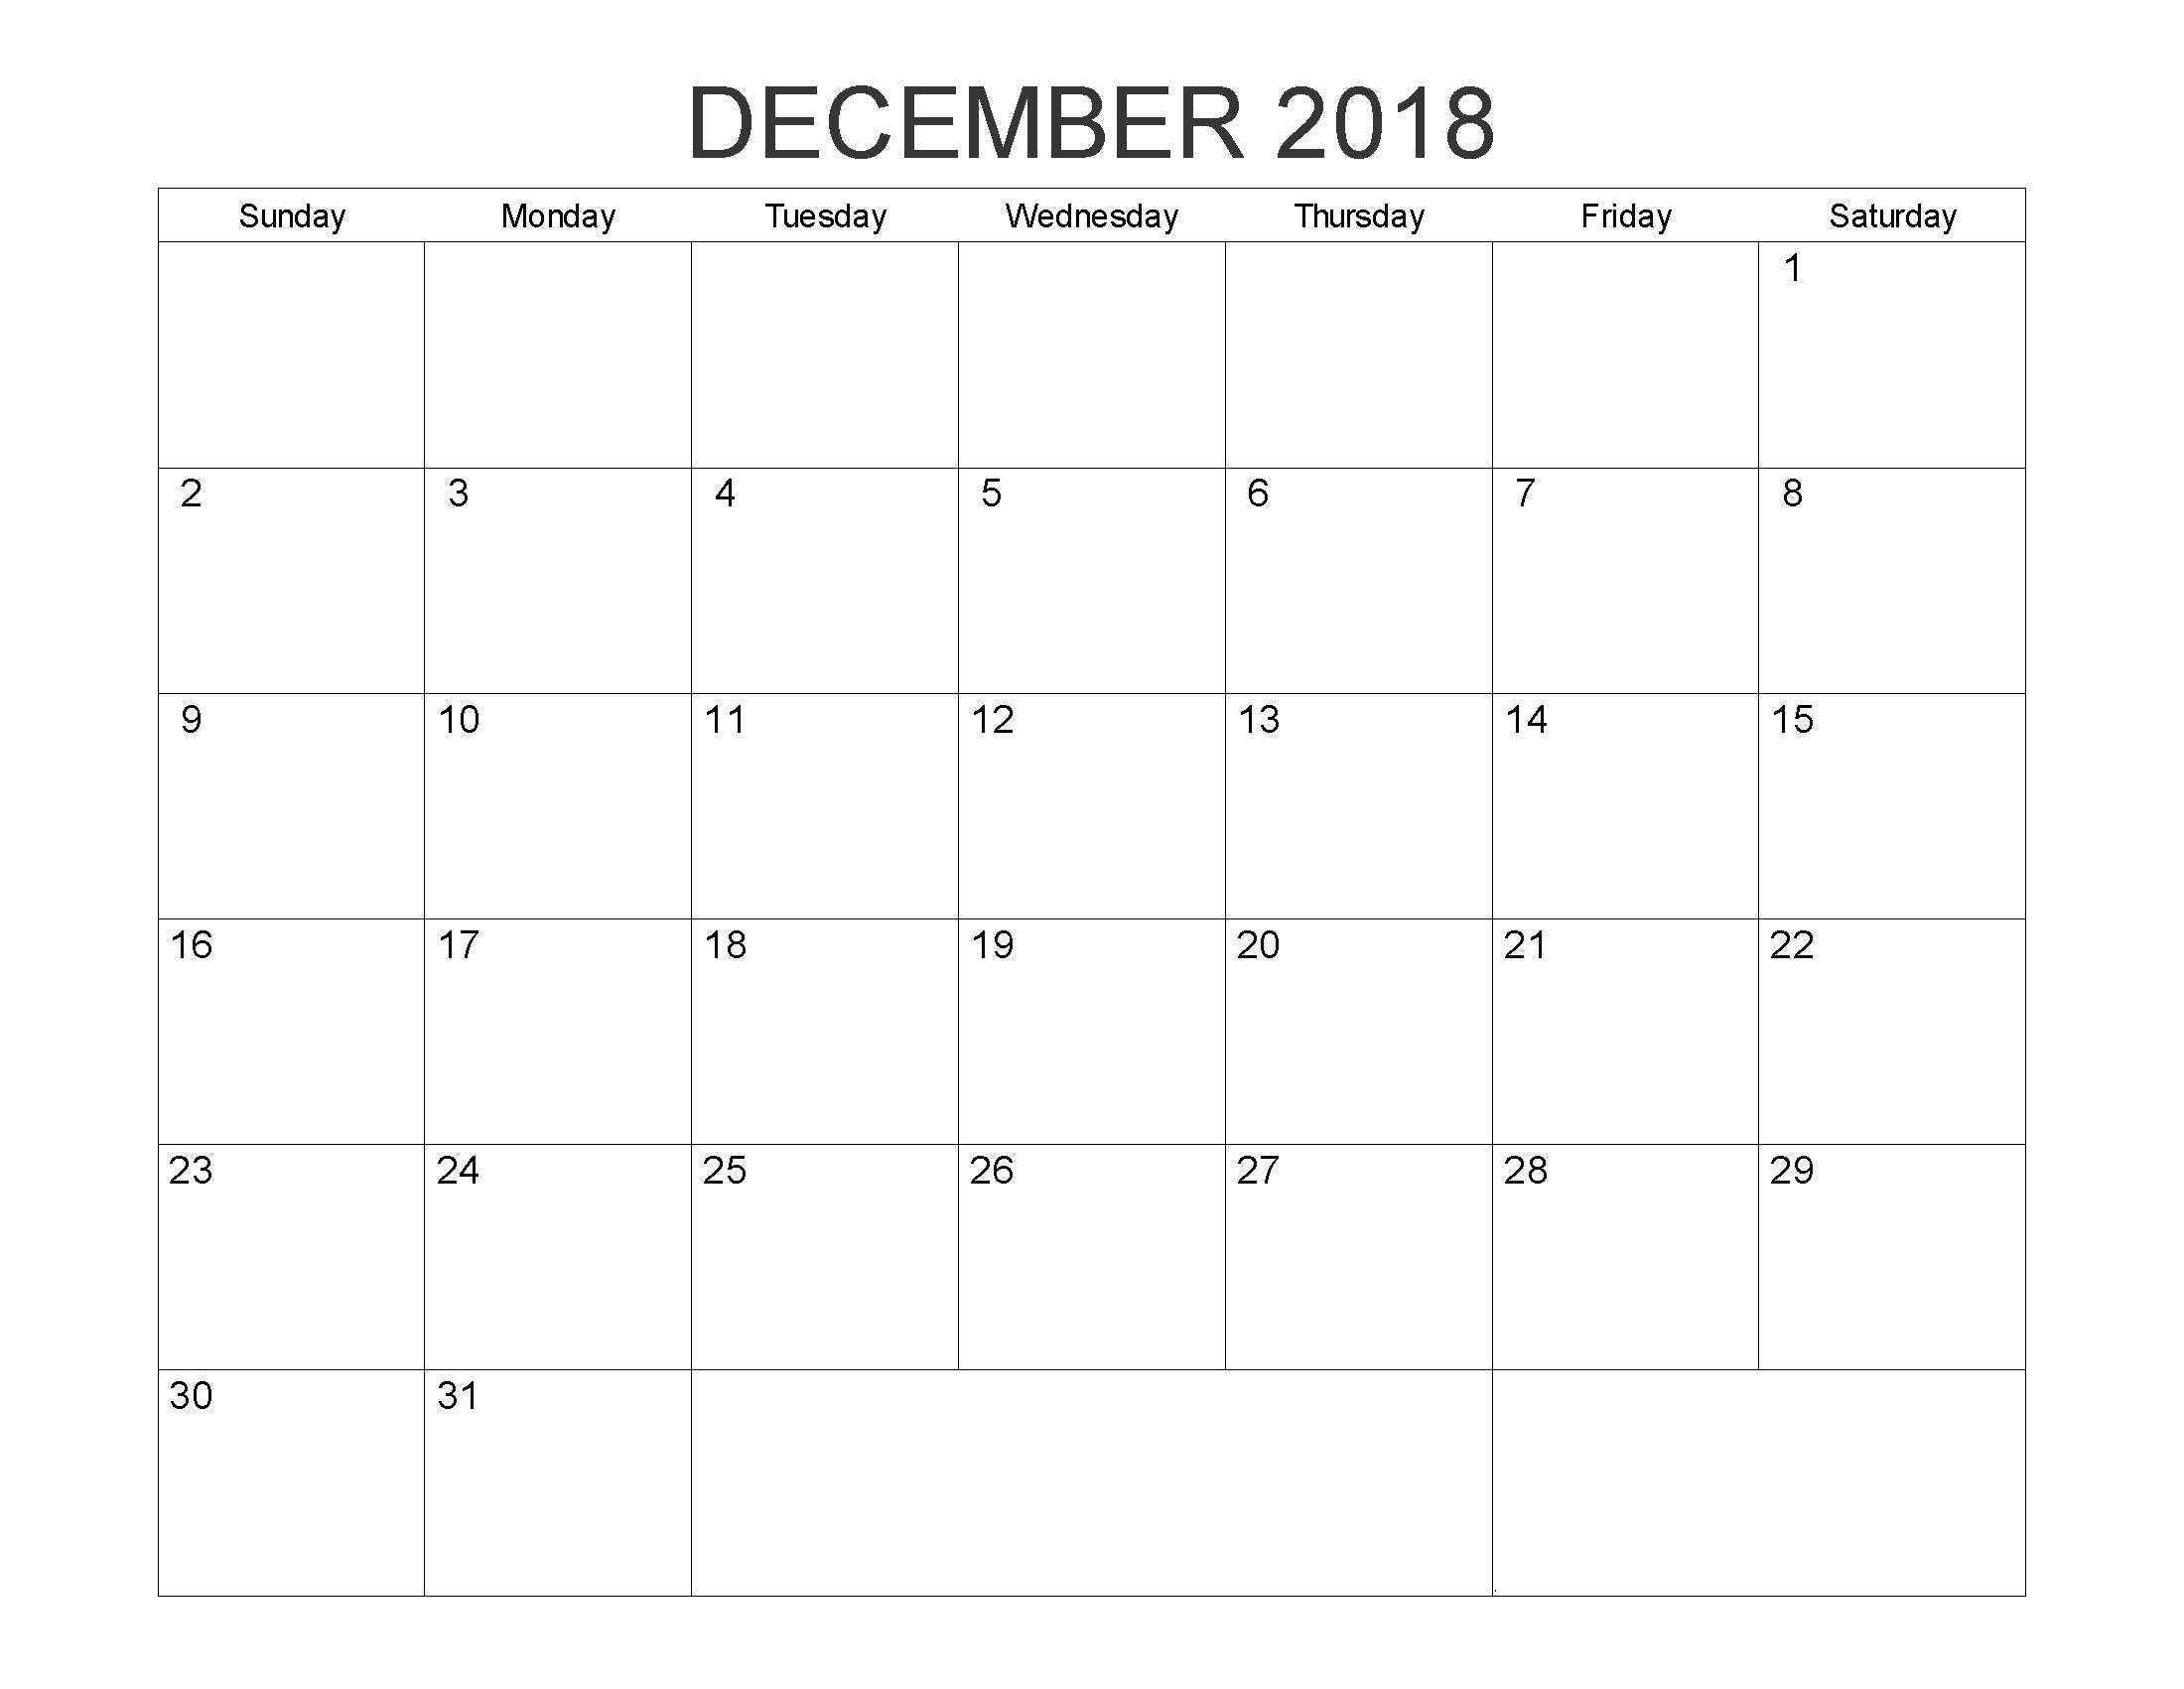 December 2018 Editable Word Calendar | 2018 Calendars | August Month for August - December Blank Calendar